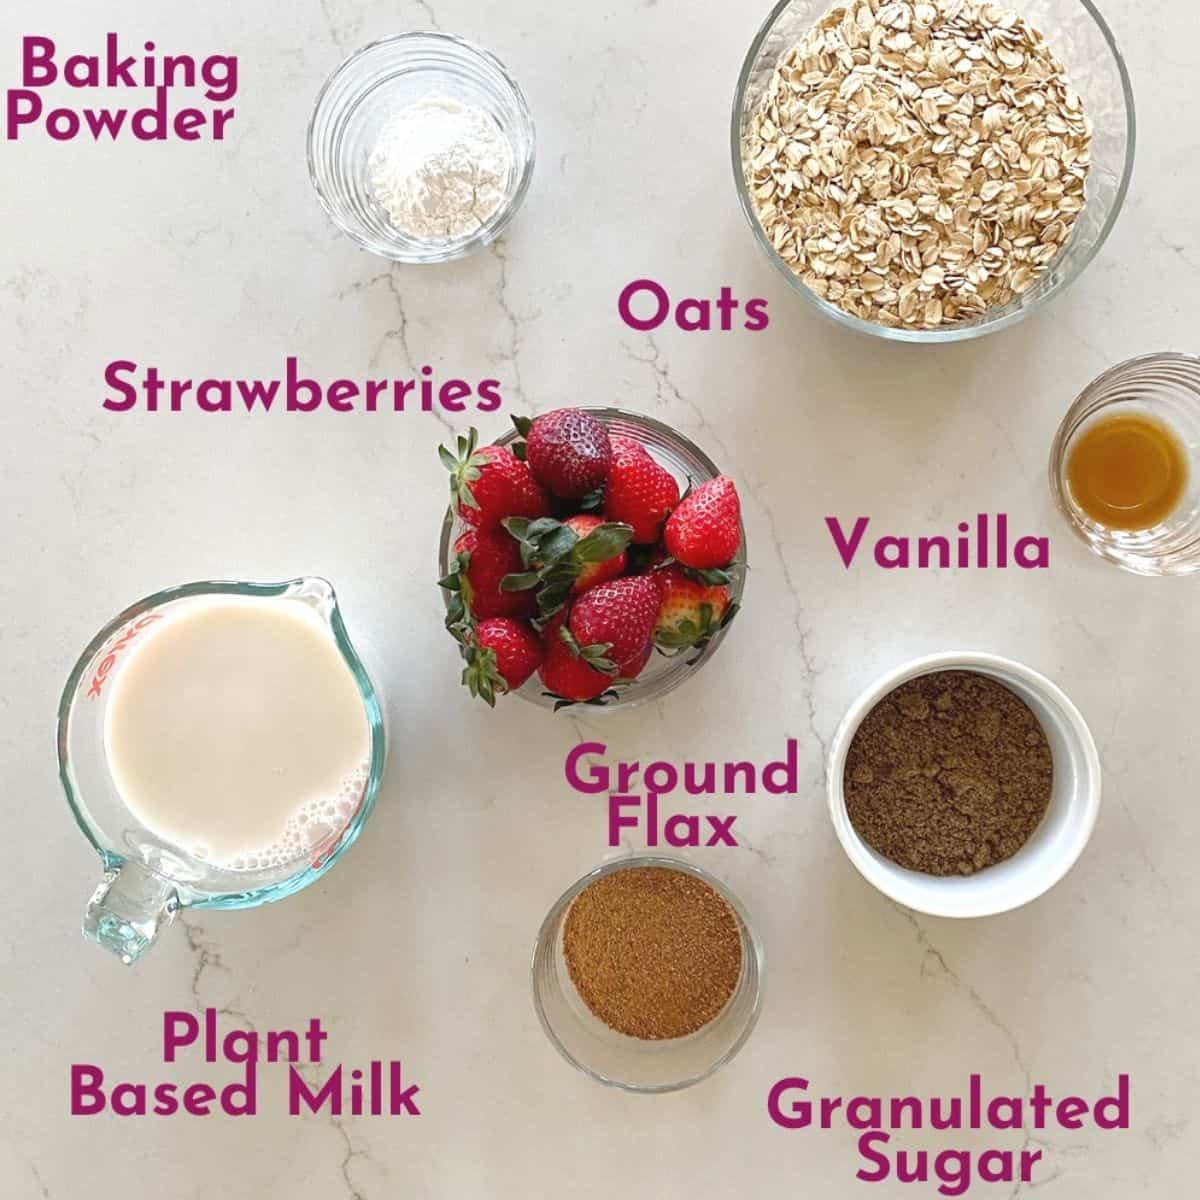 Ingredients for strawberry baked oatmeal- strawberries, oats, milk, ground flax, baking powder, sugar, vanilla